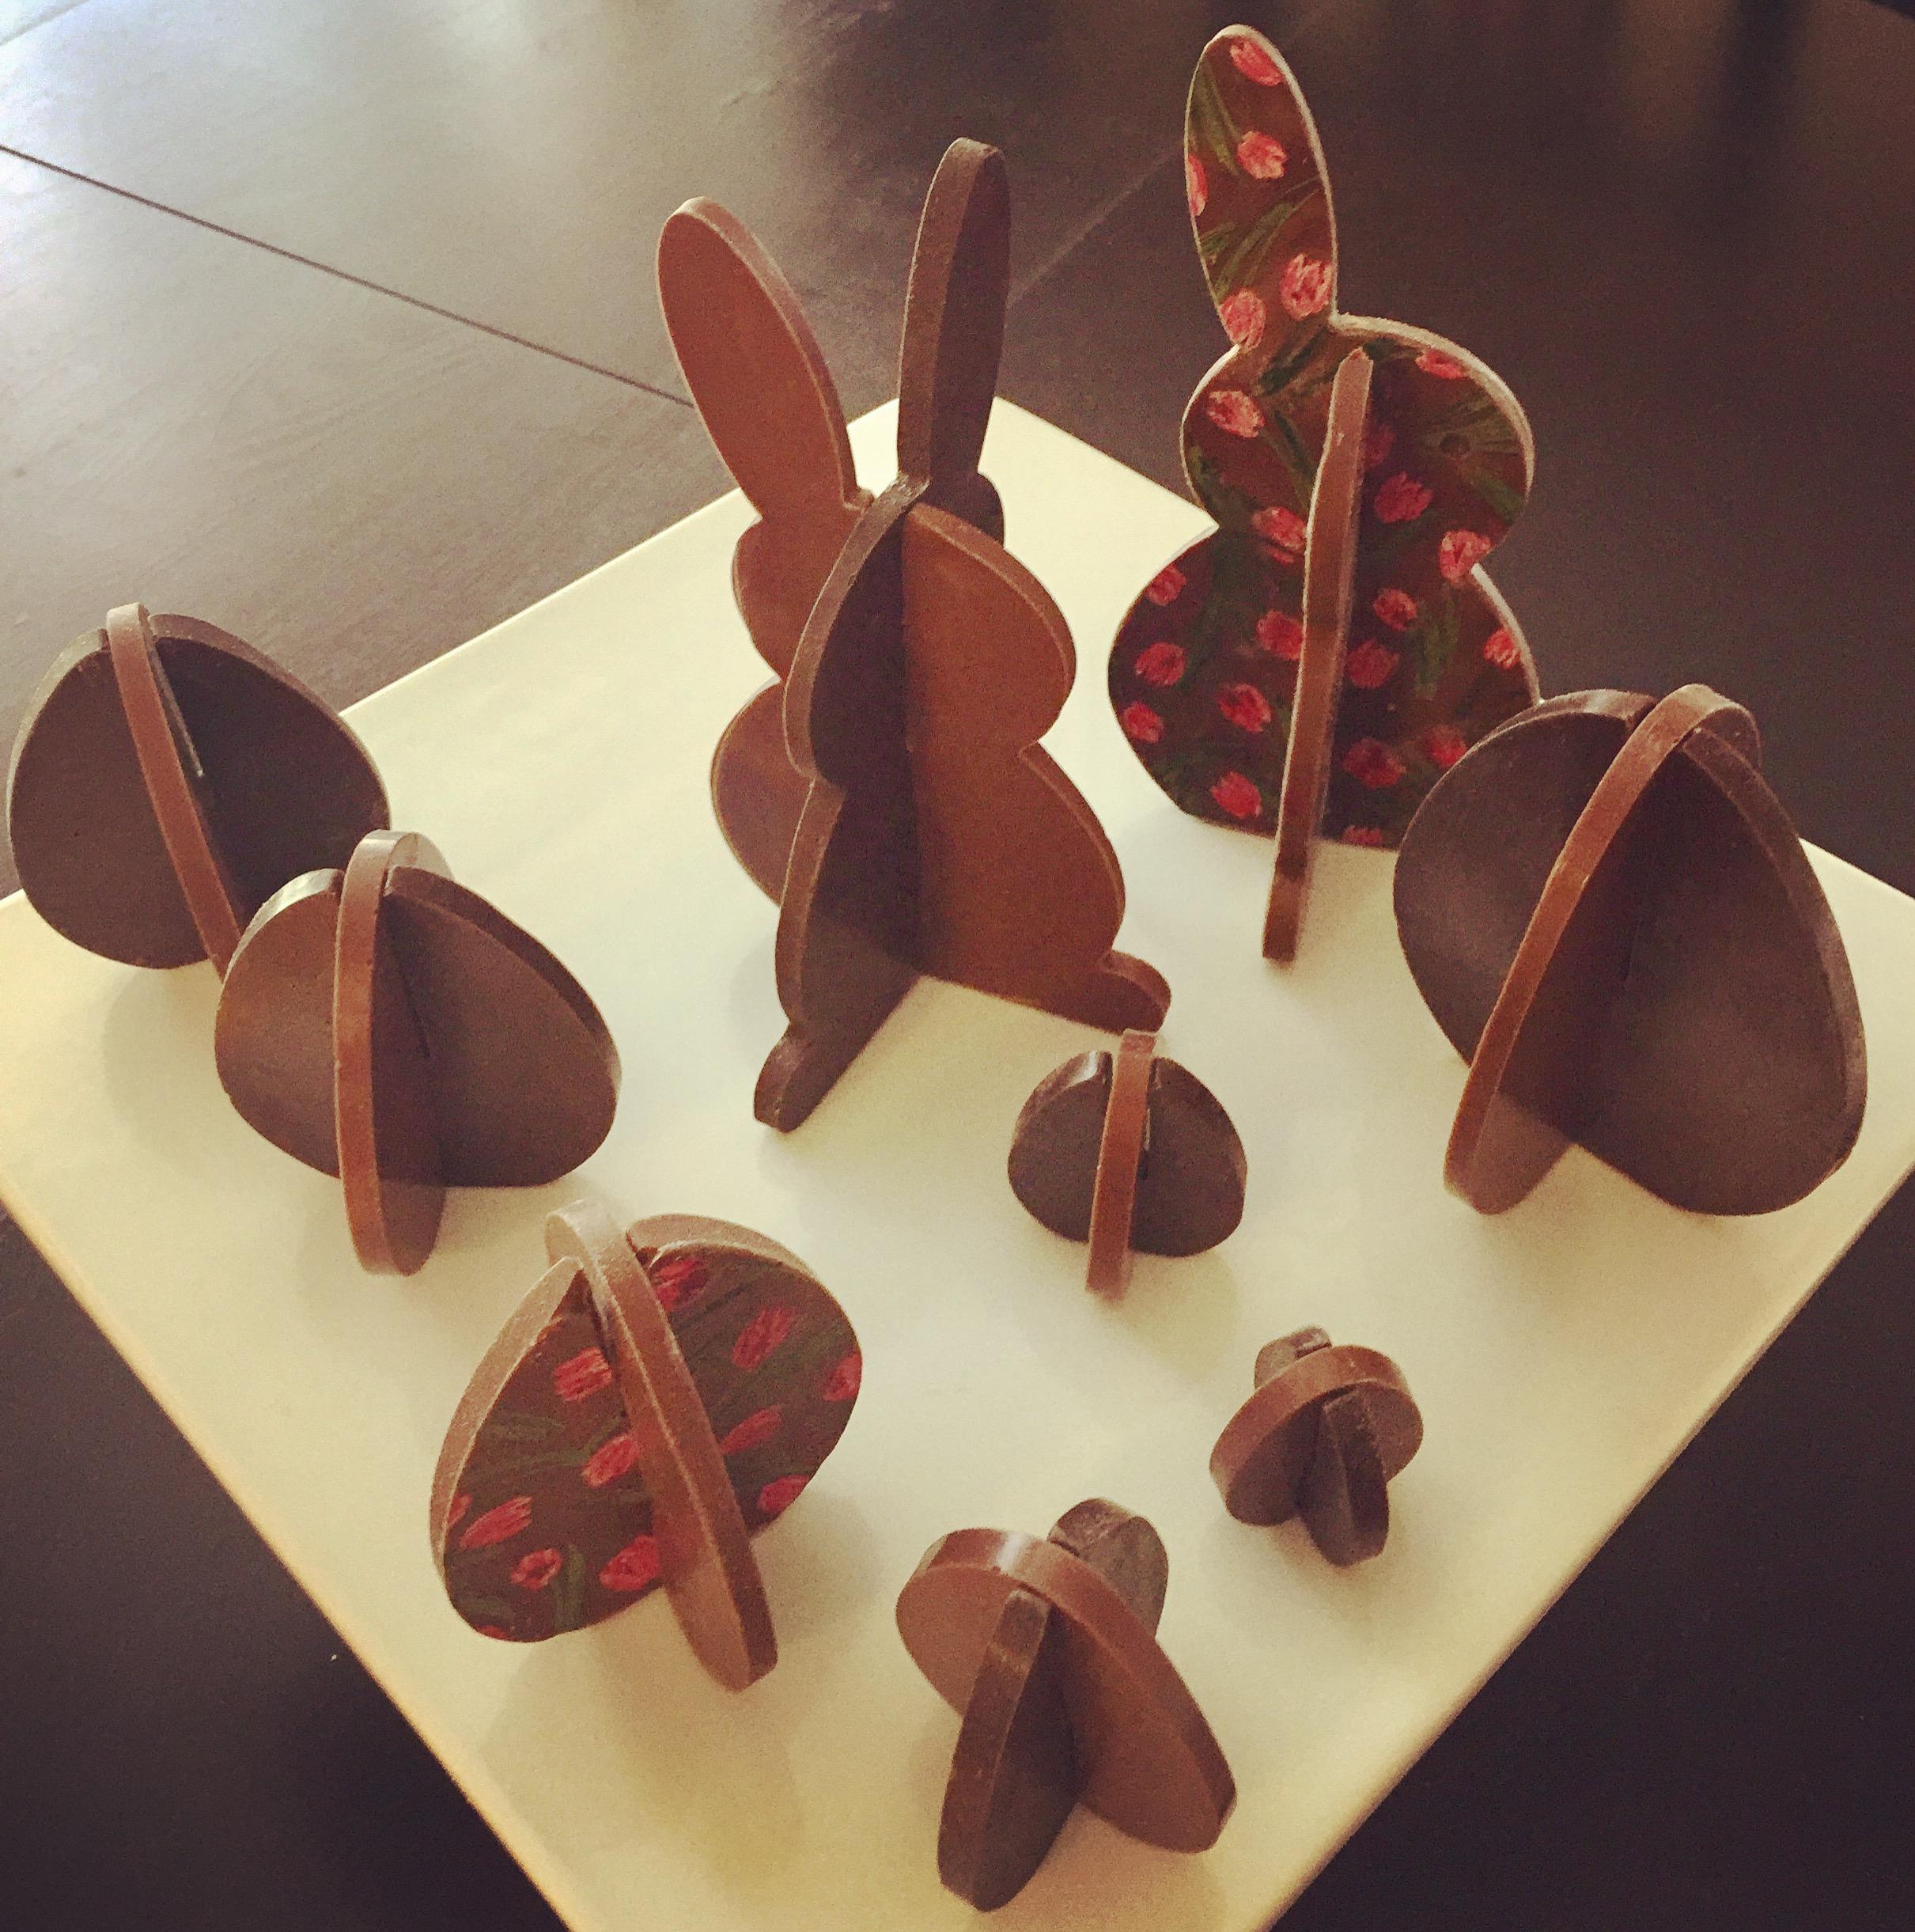 3D Chocolate Bunnies